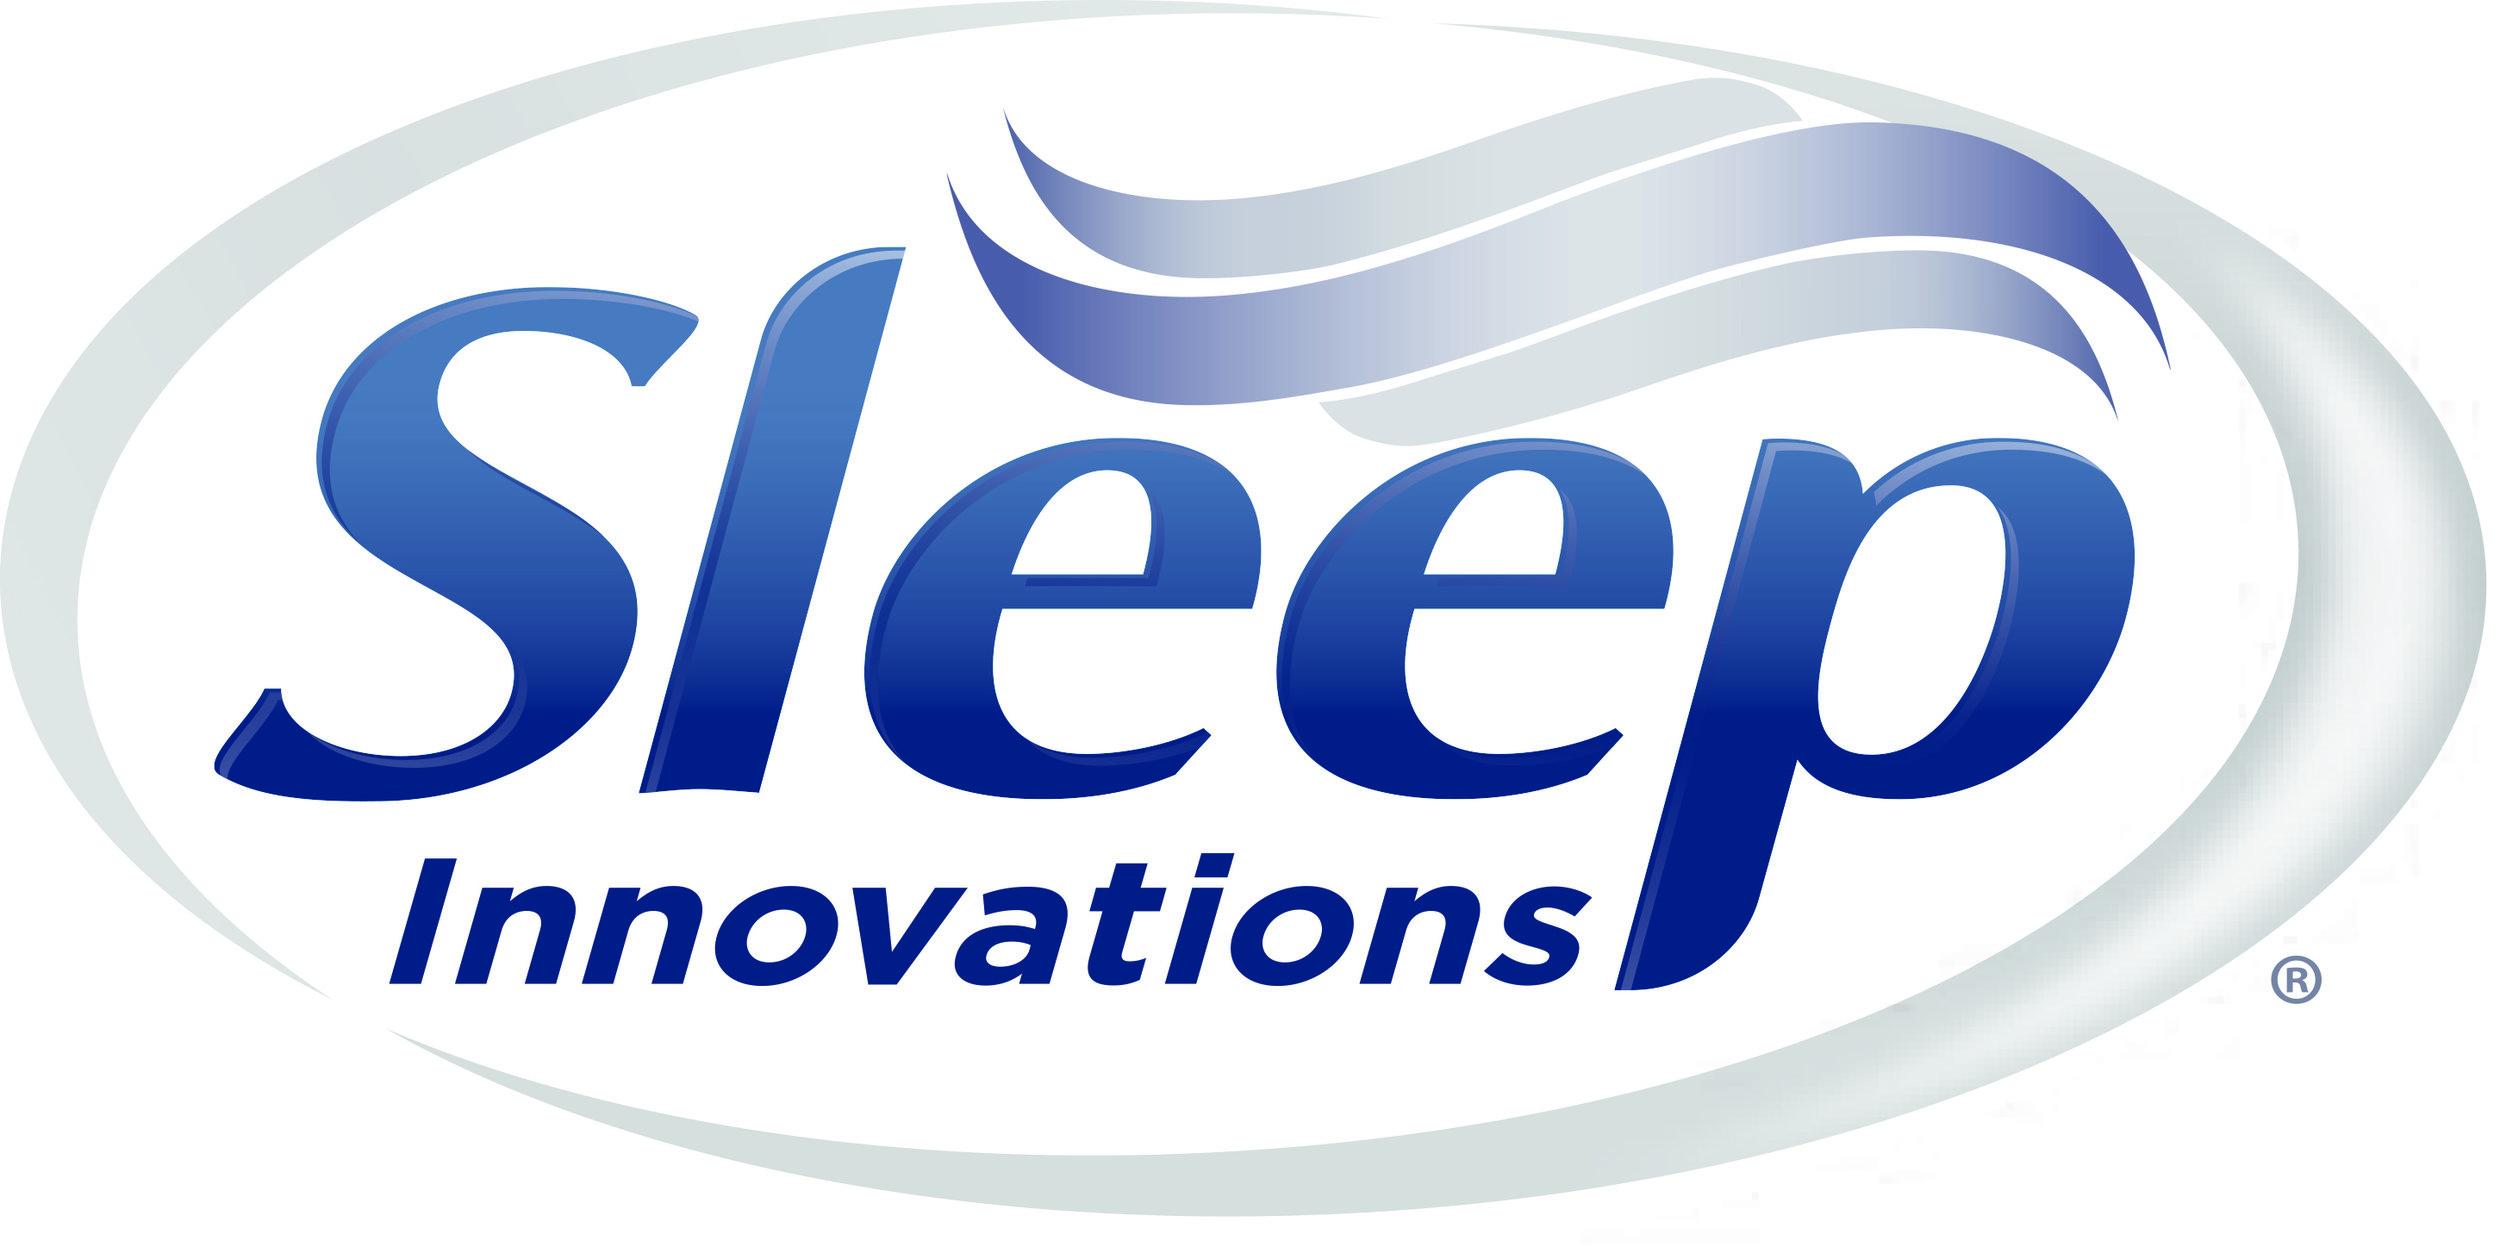 SleepLogo.jpg